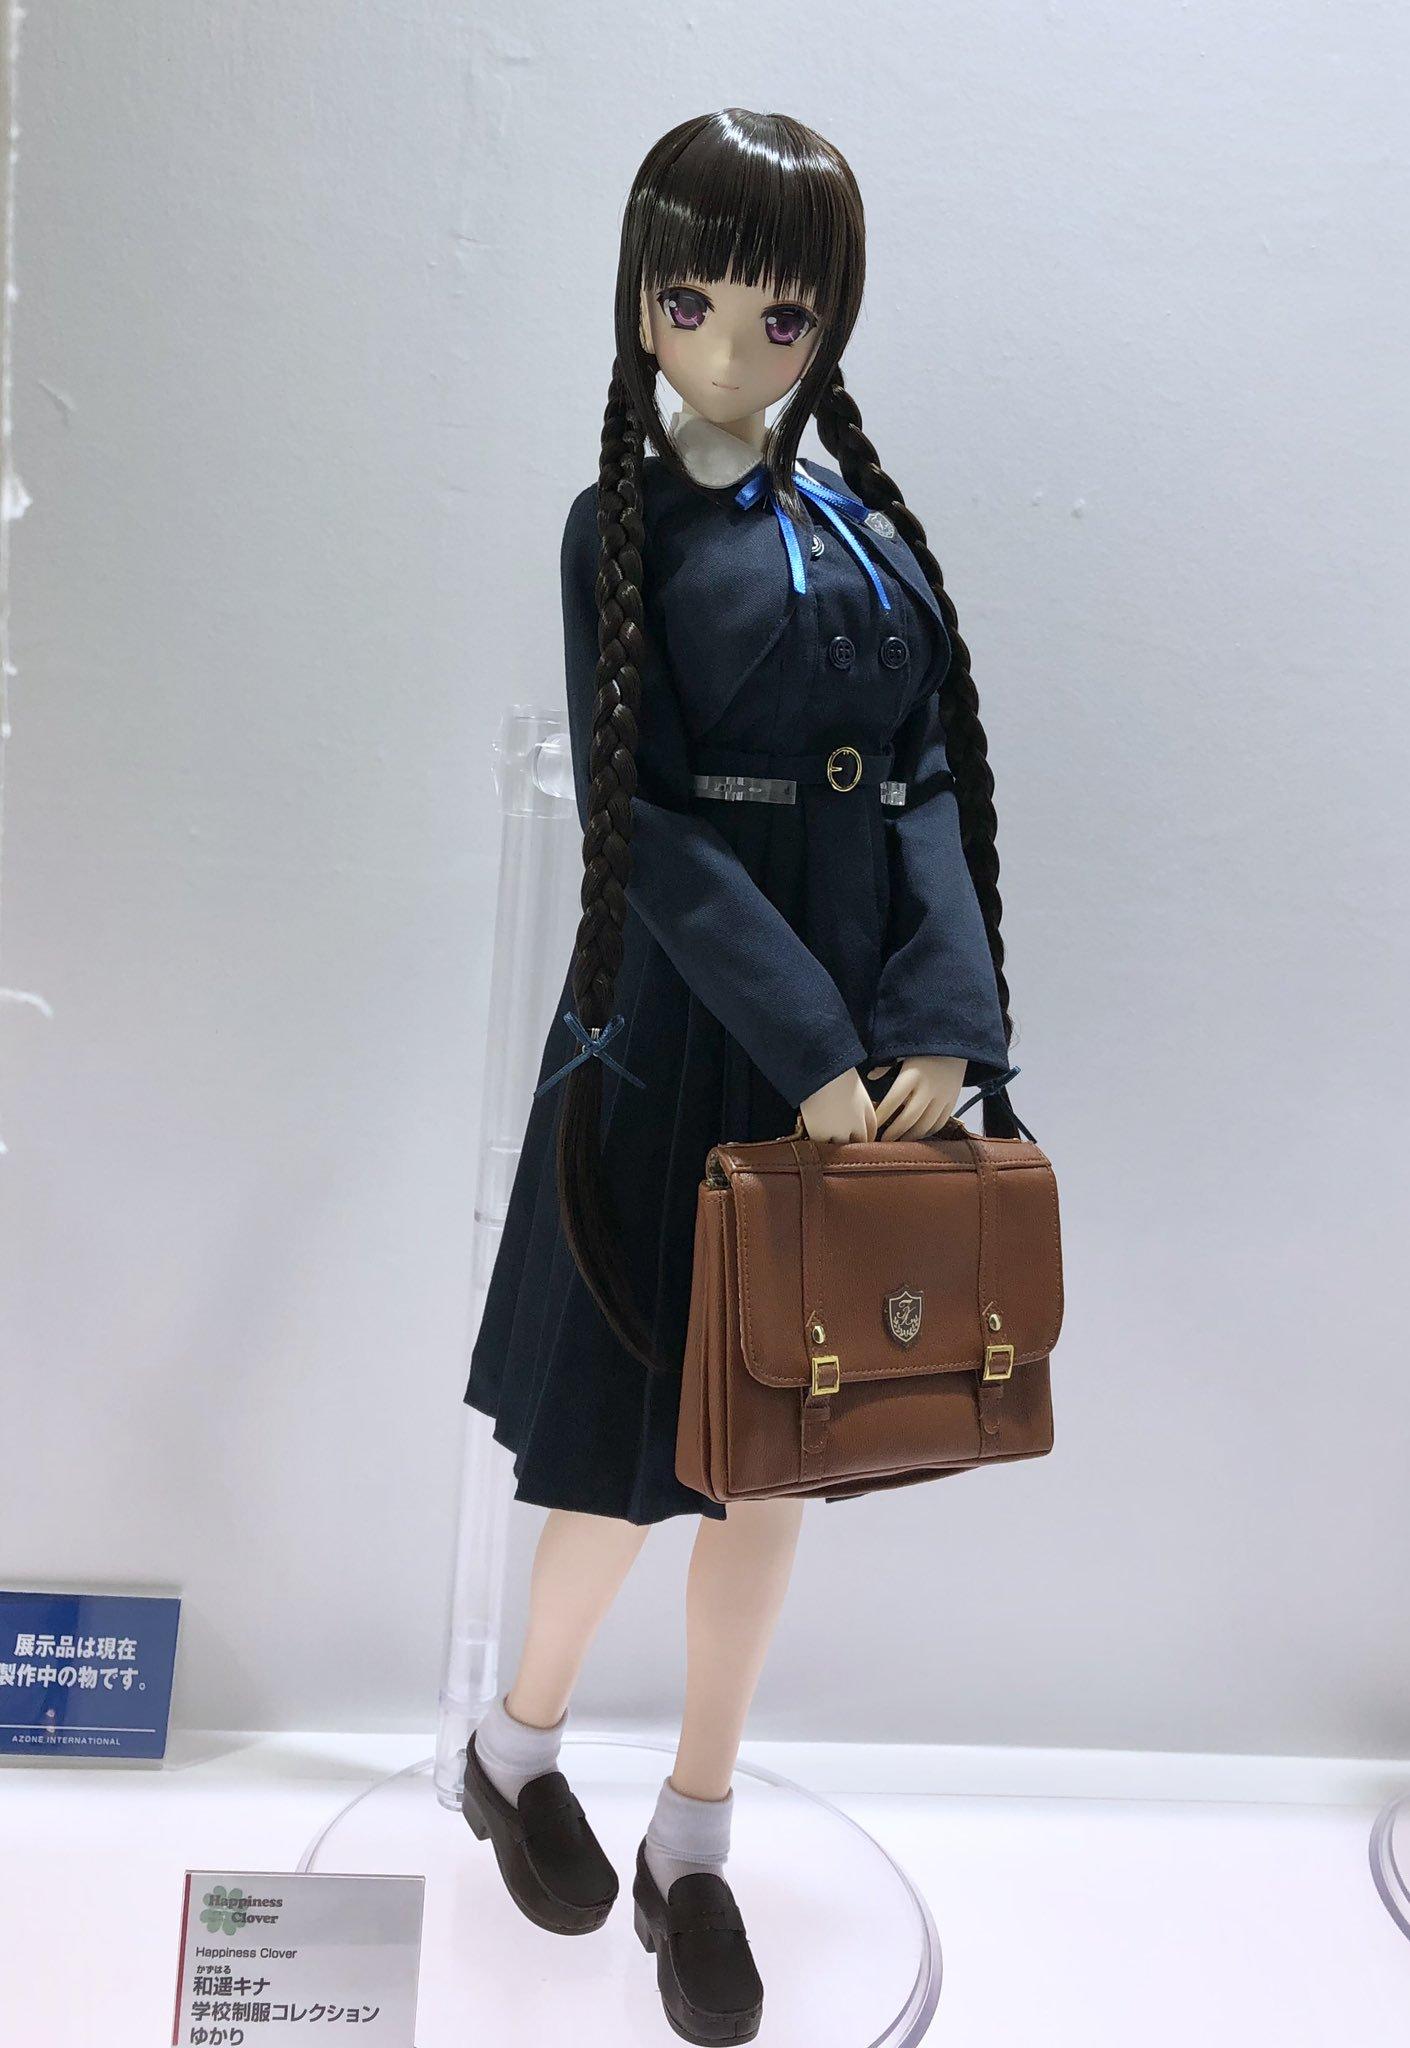 [Azone] 1/3 Happiness Clover - Yukari - Kazuharu Kina School Uniform Collection  Eaicm311